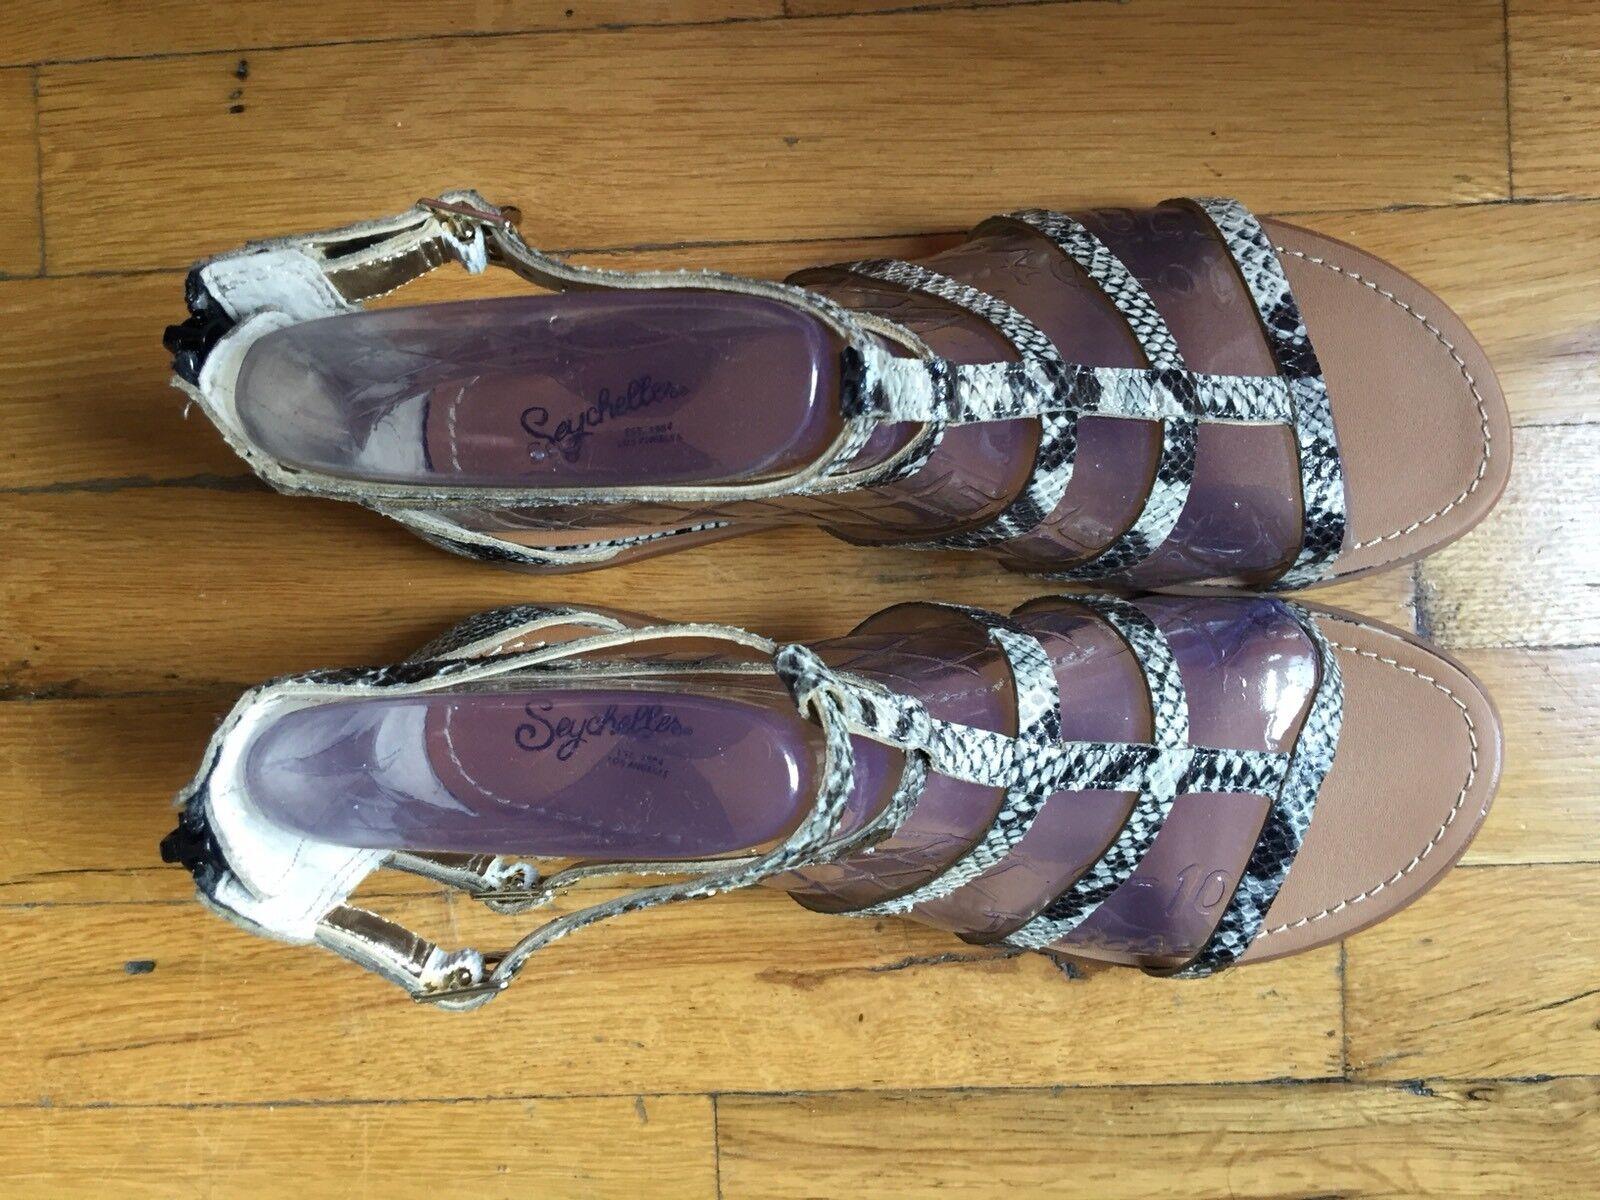 Seychelles Damenschuhe Gladiator Sandales Snakeskin. Größe Box. 10. New In Box. Größe ea4938